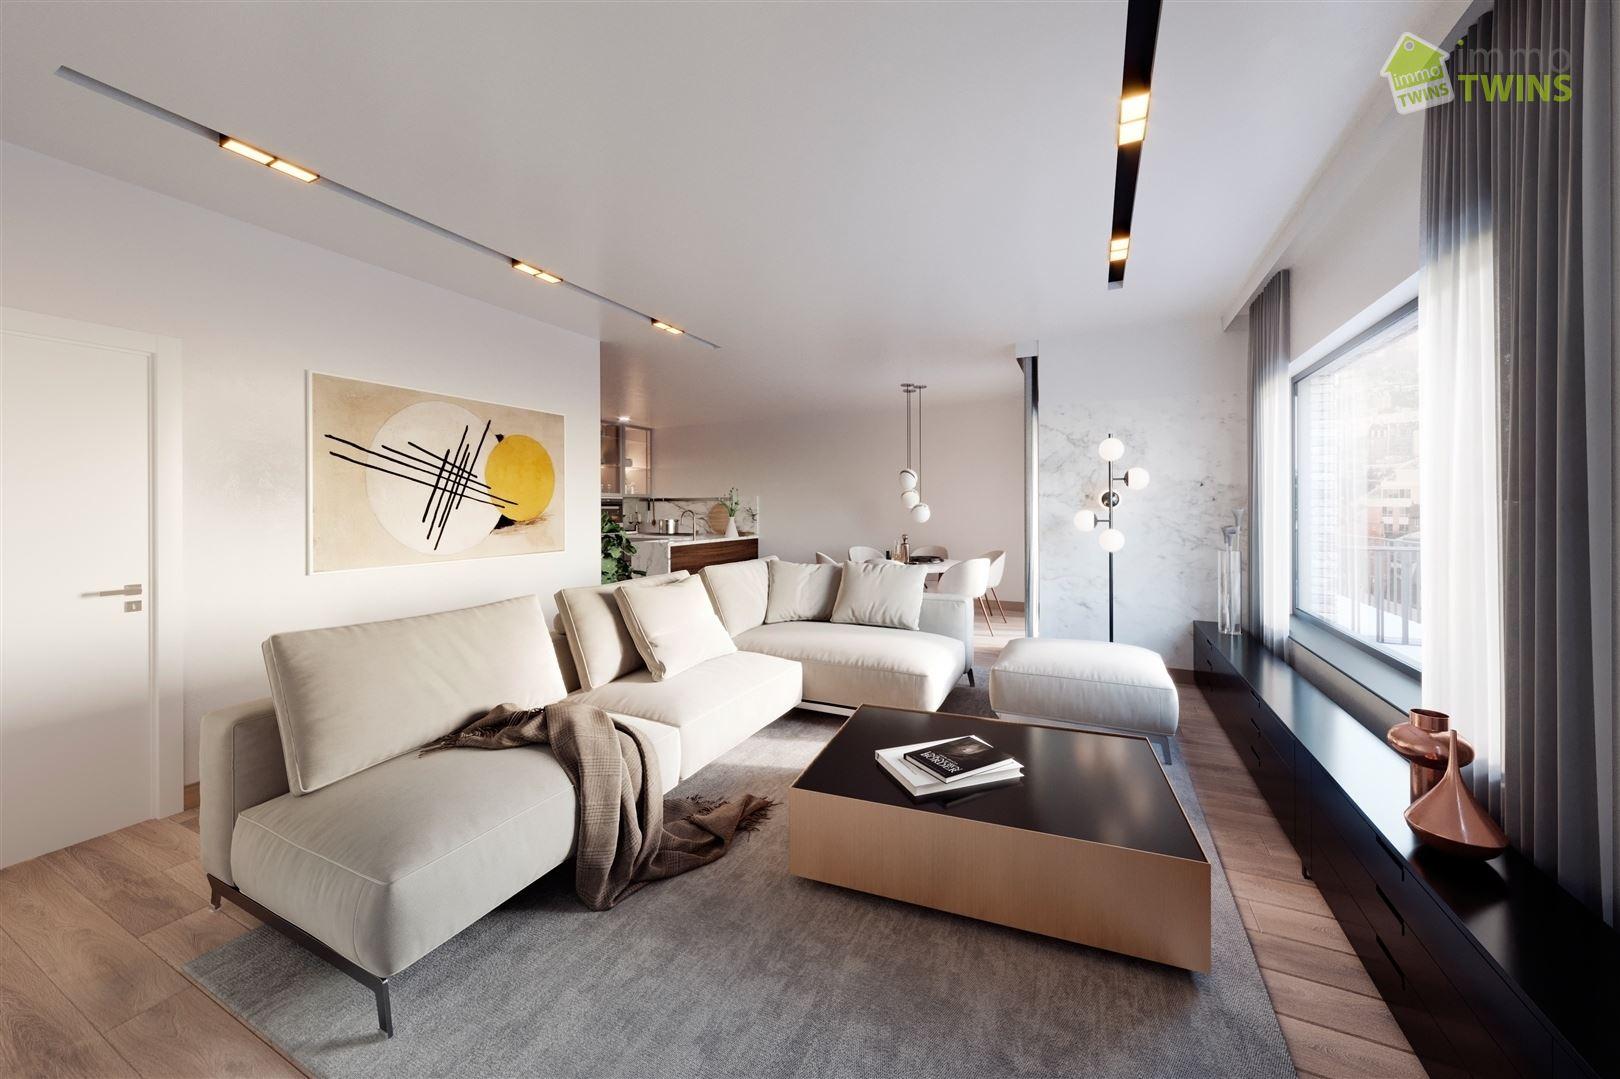 Foto 4 : Penthouse te 9220 MOERZEKE (België) - Prijs € 183.000